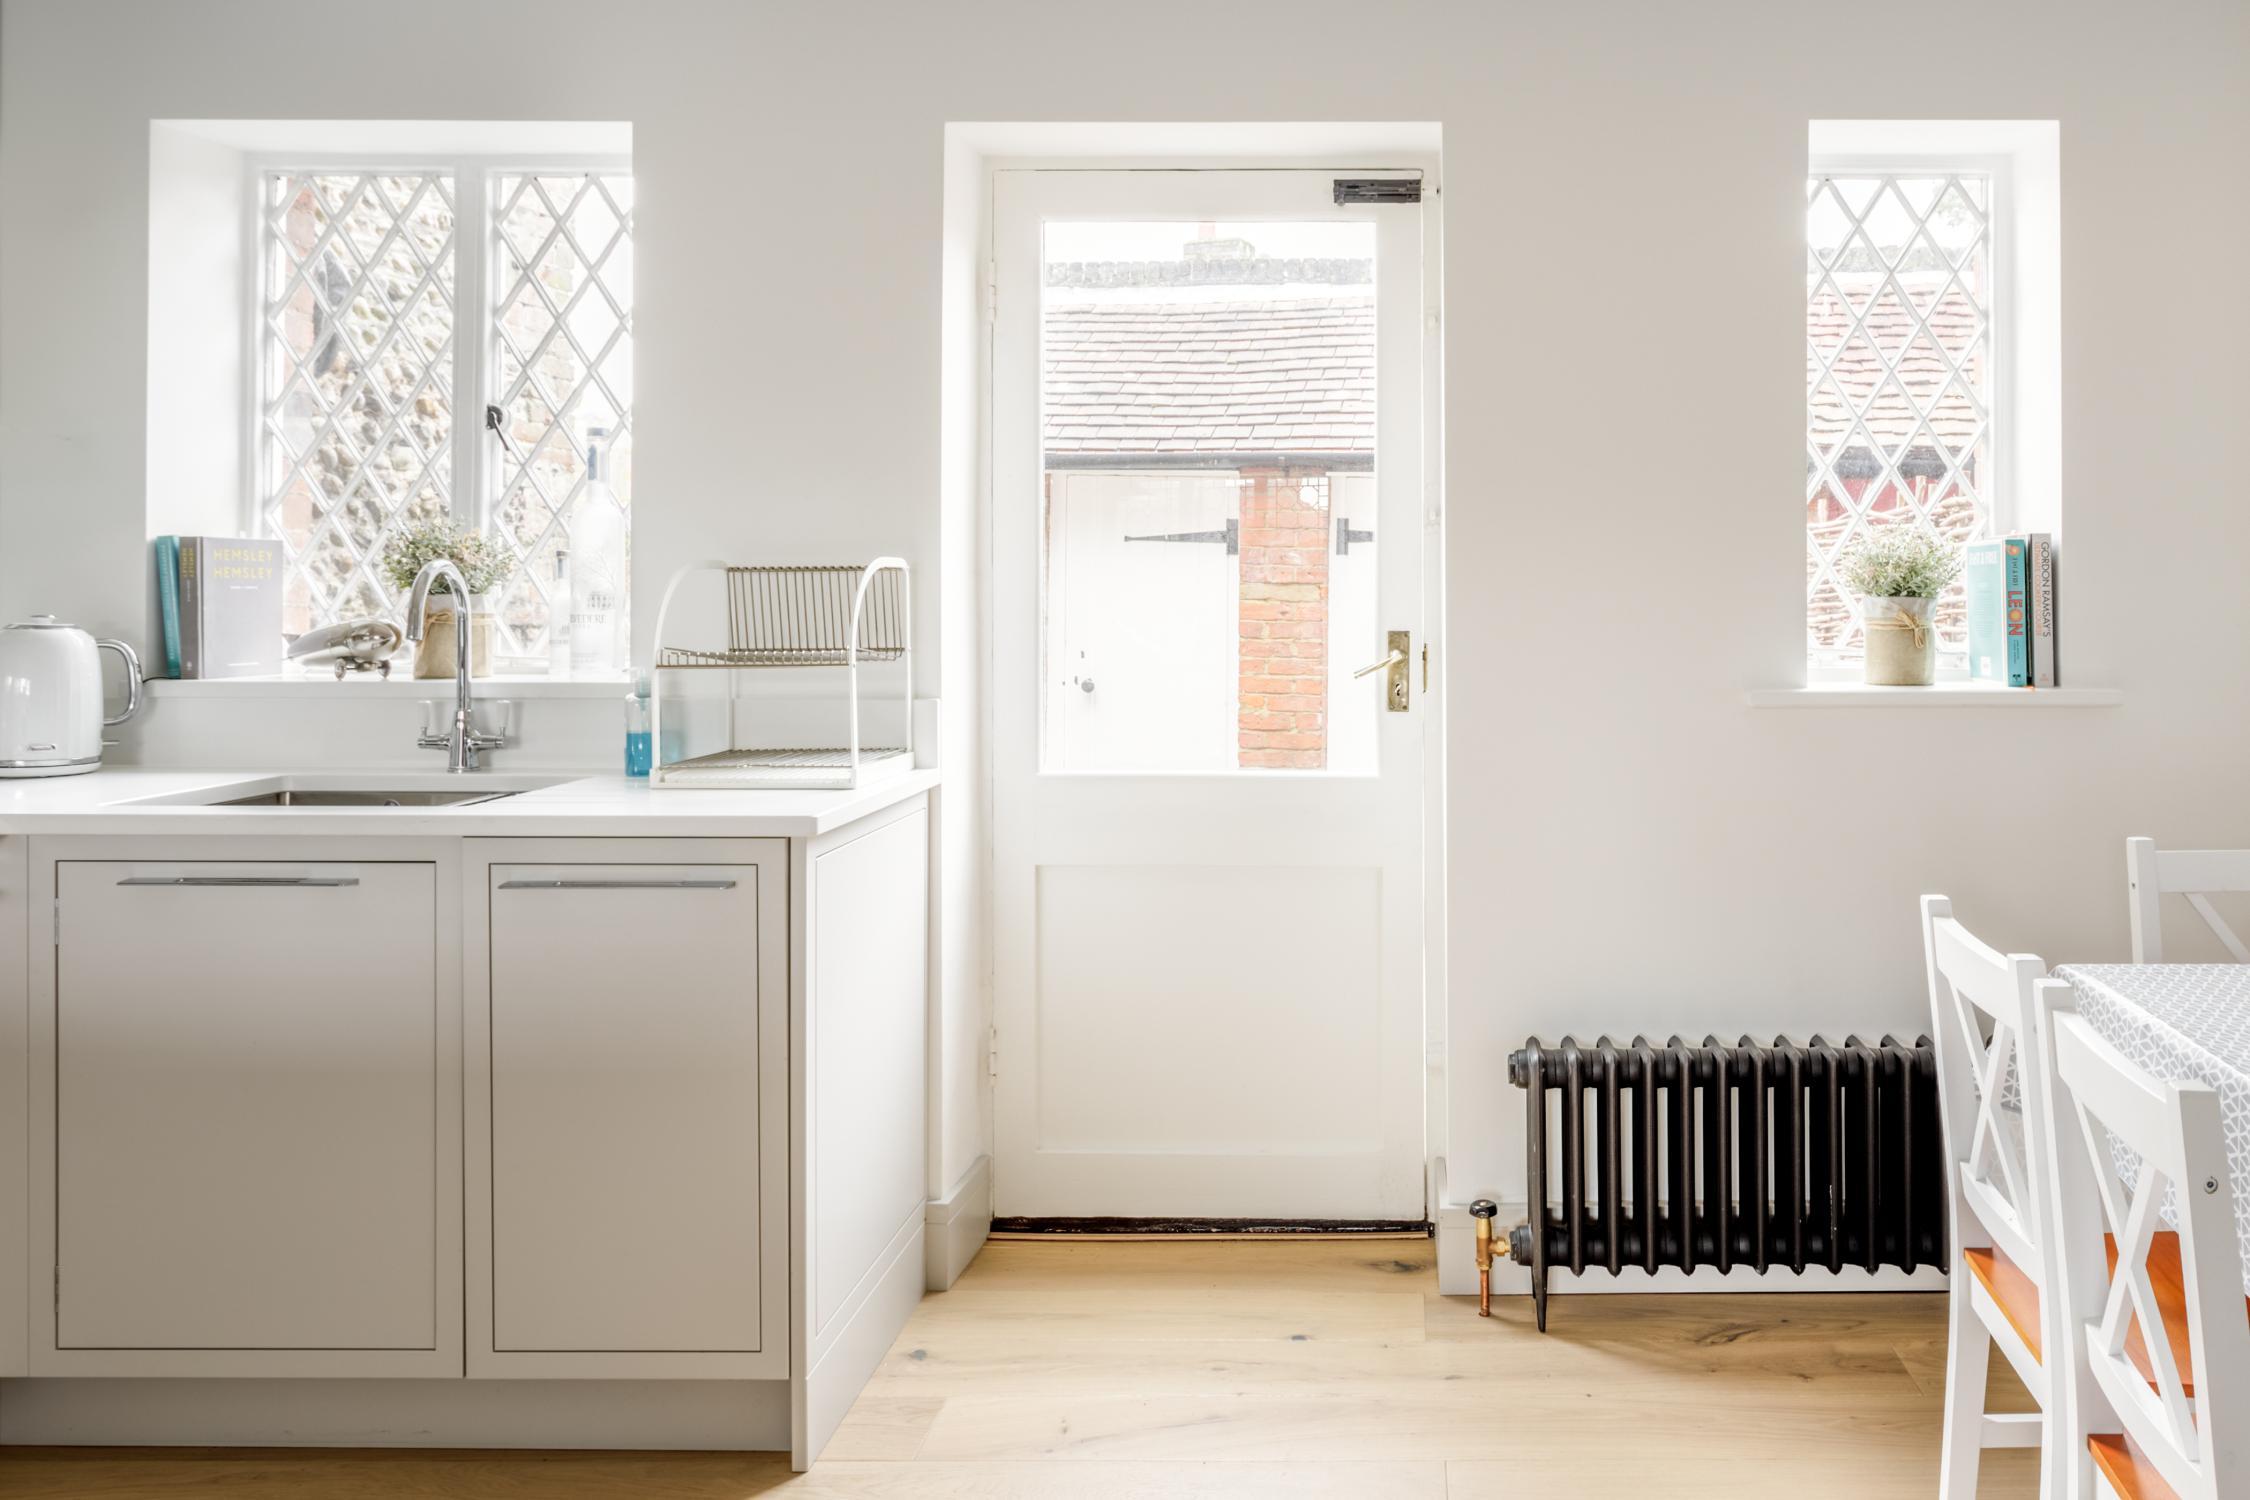 Worthing Builders-ExtraOrdinaryRooms-Arundel renovation Kitchen.jpg